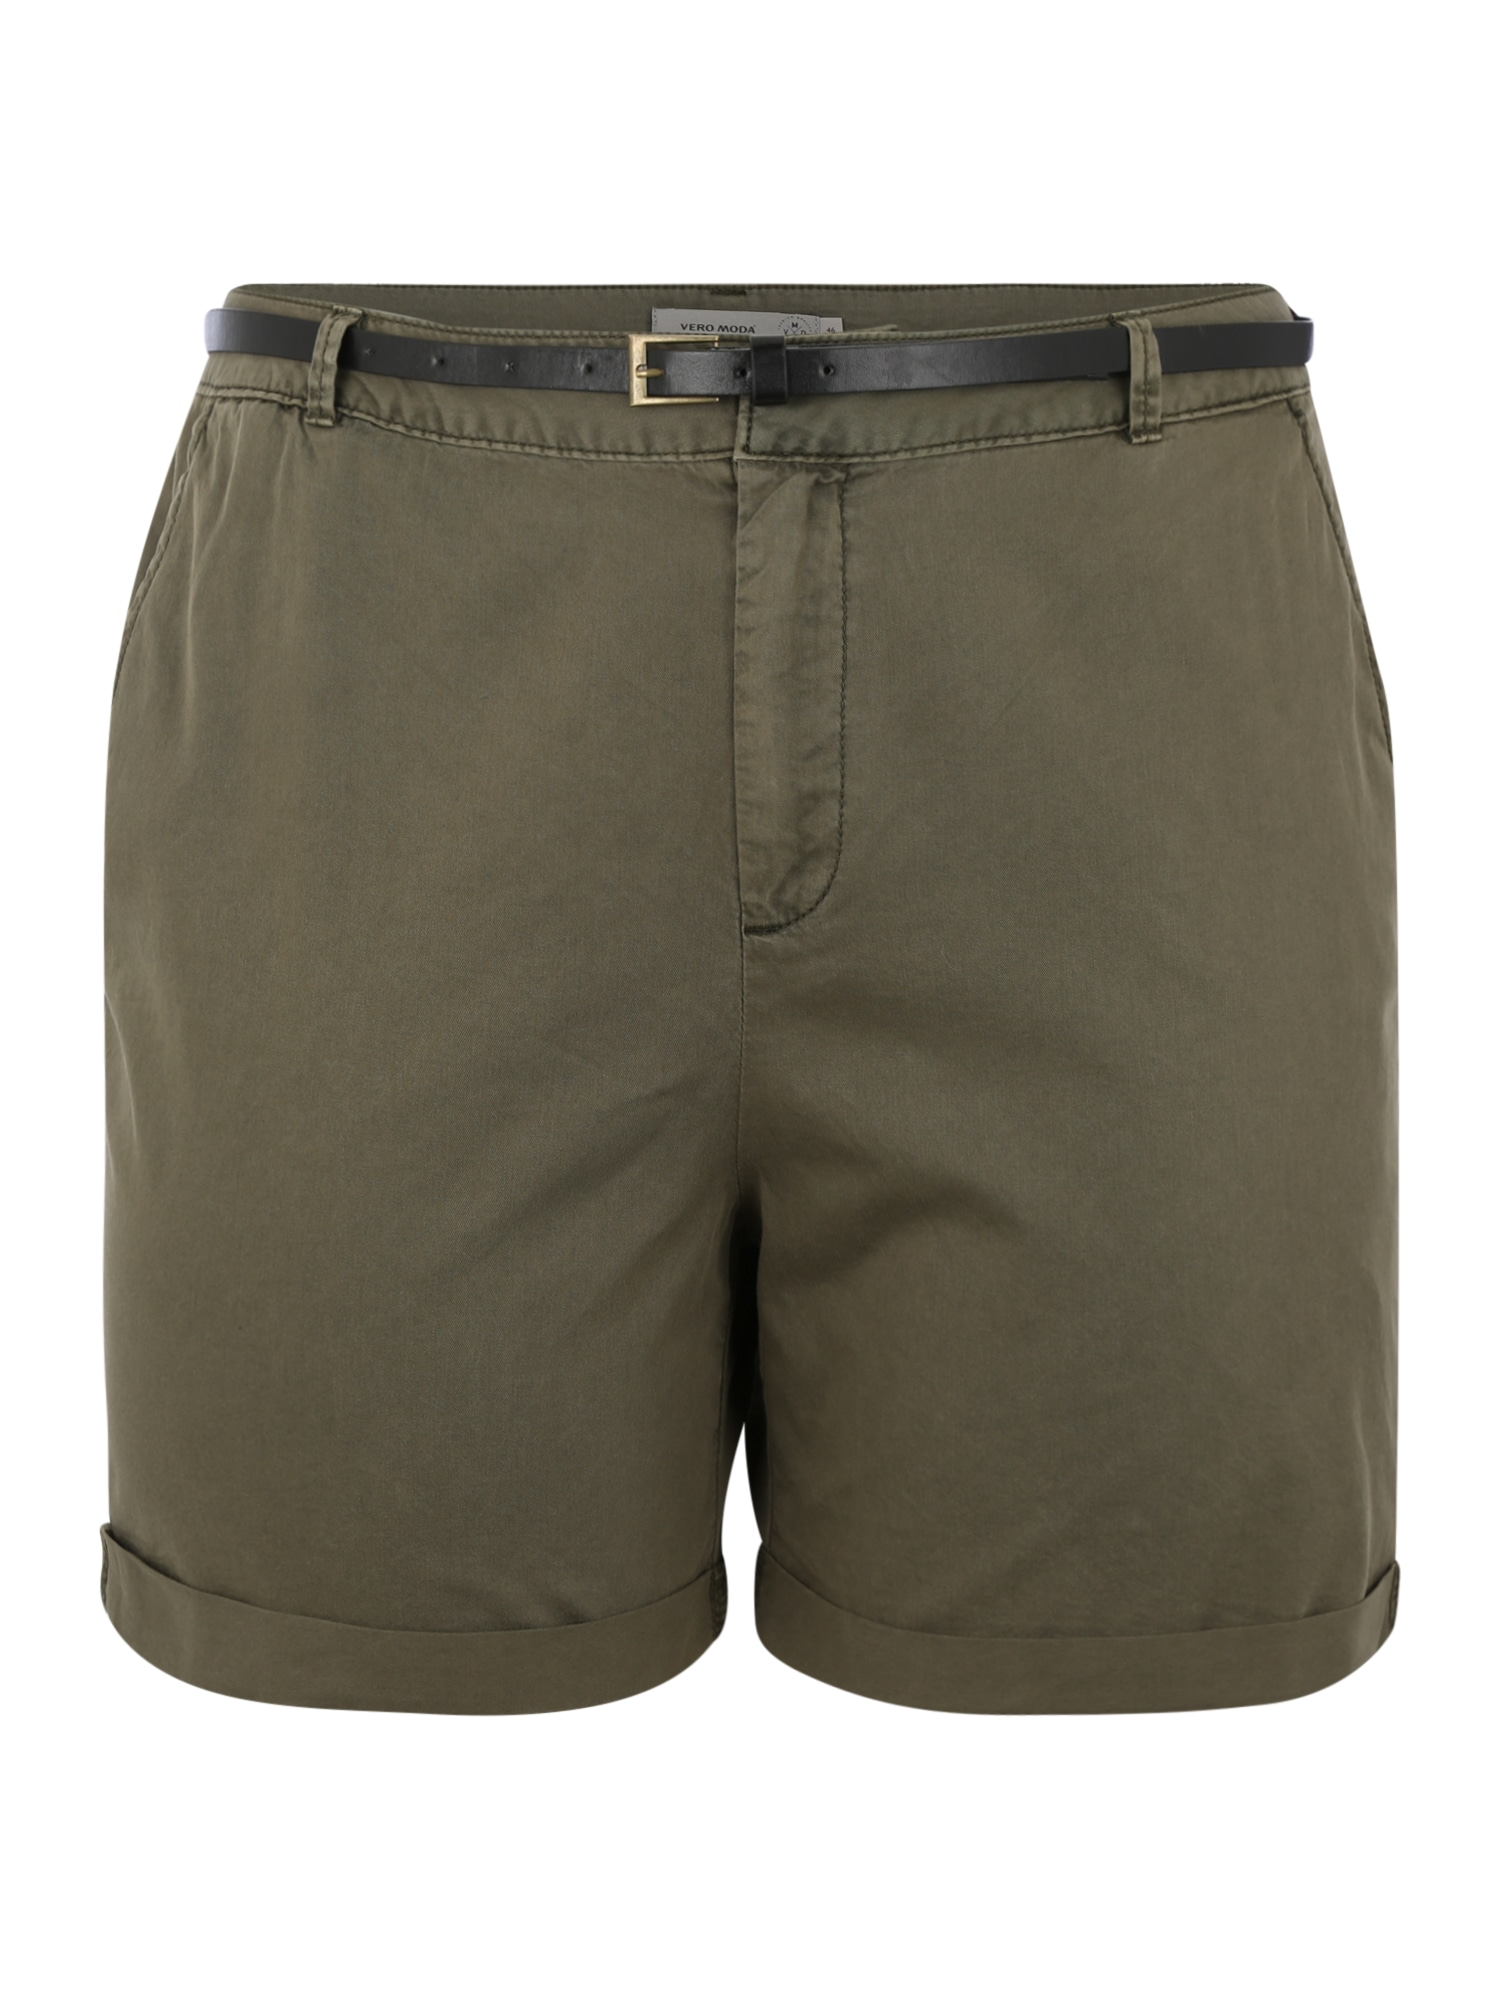 Chino kalhoty Flash khaki Vero Moda Curve